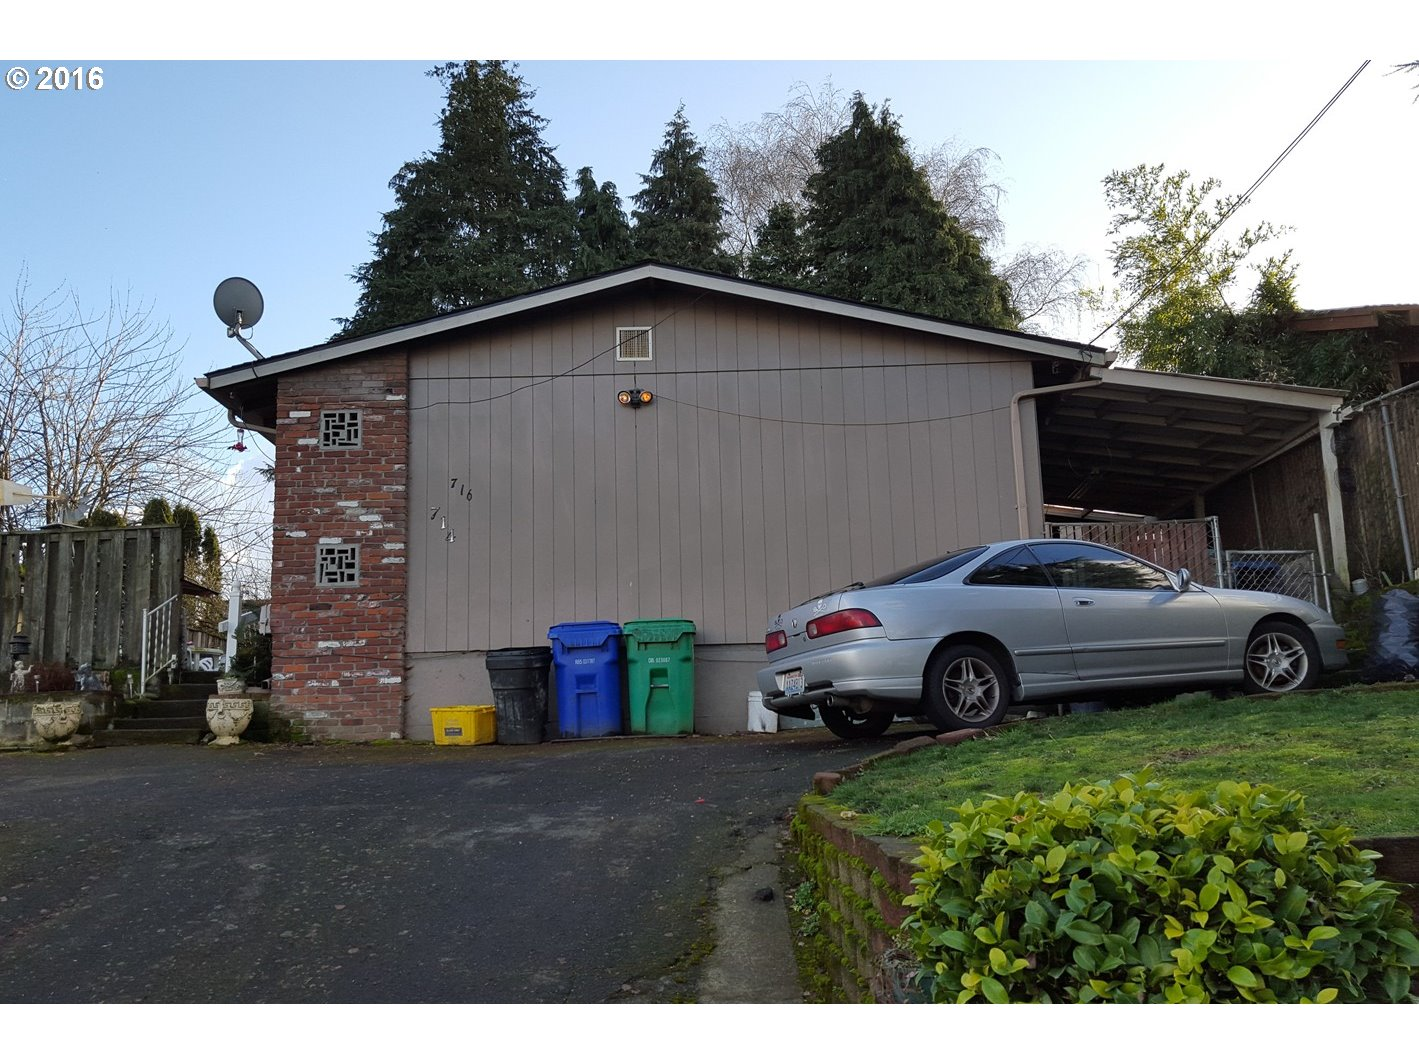 714 N WATTS ST Portland, OR 97217 16439170